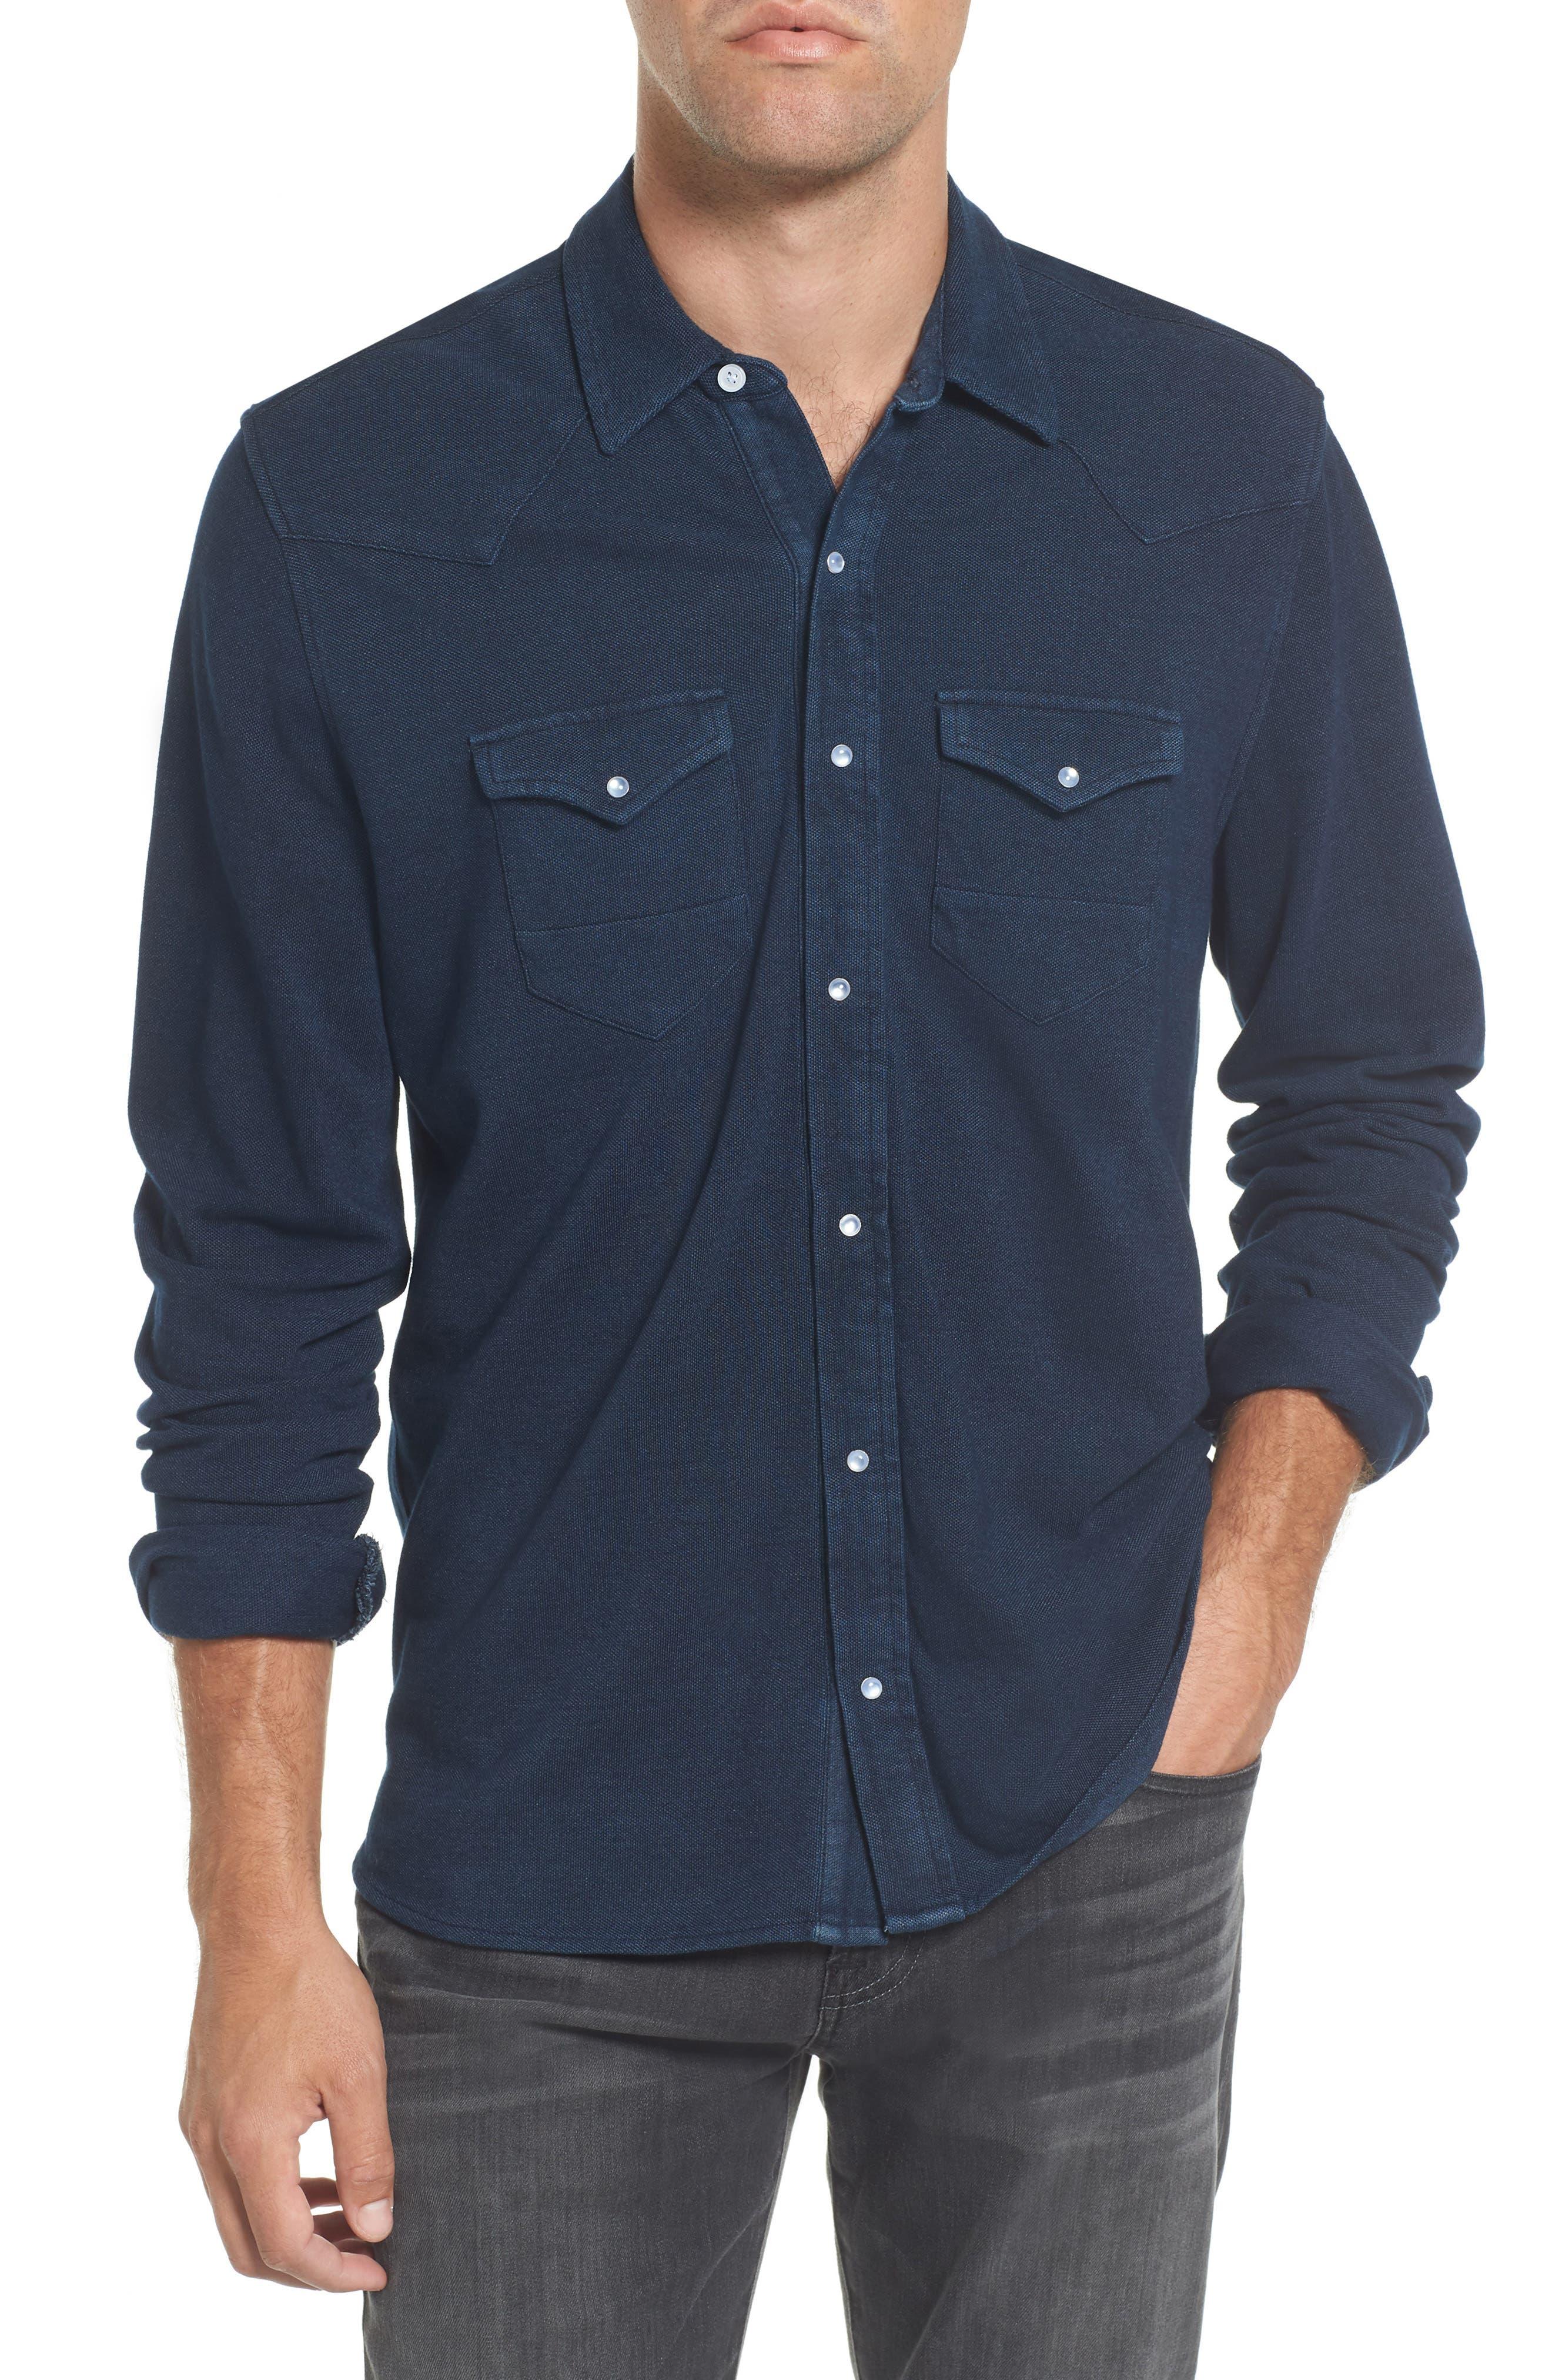 Main Image - Michael Bastian Indigo Piqué Knit Western Shirt